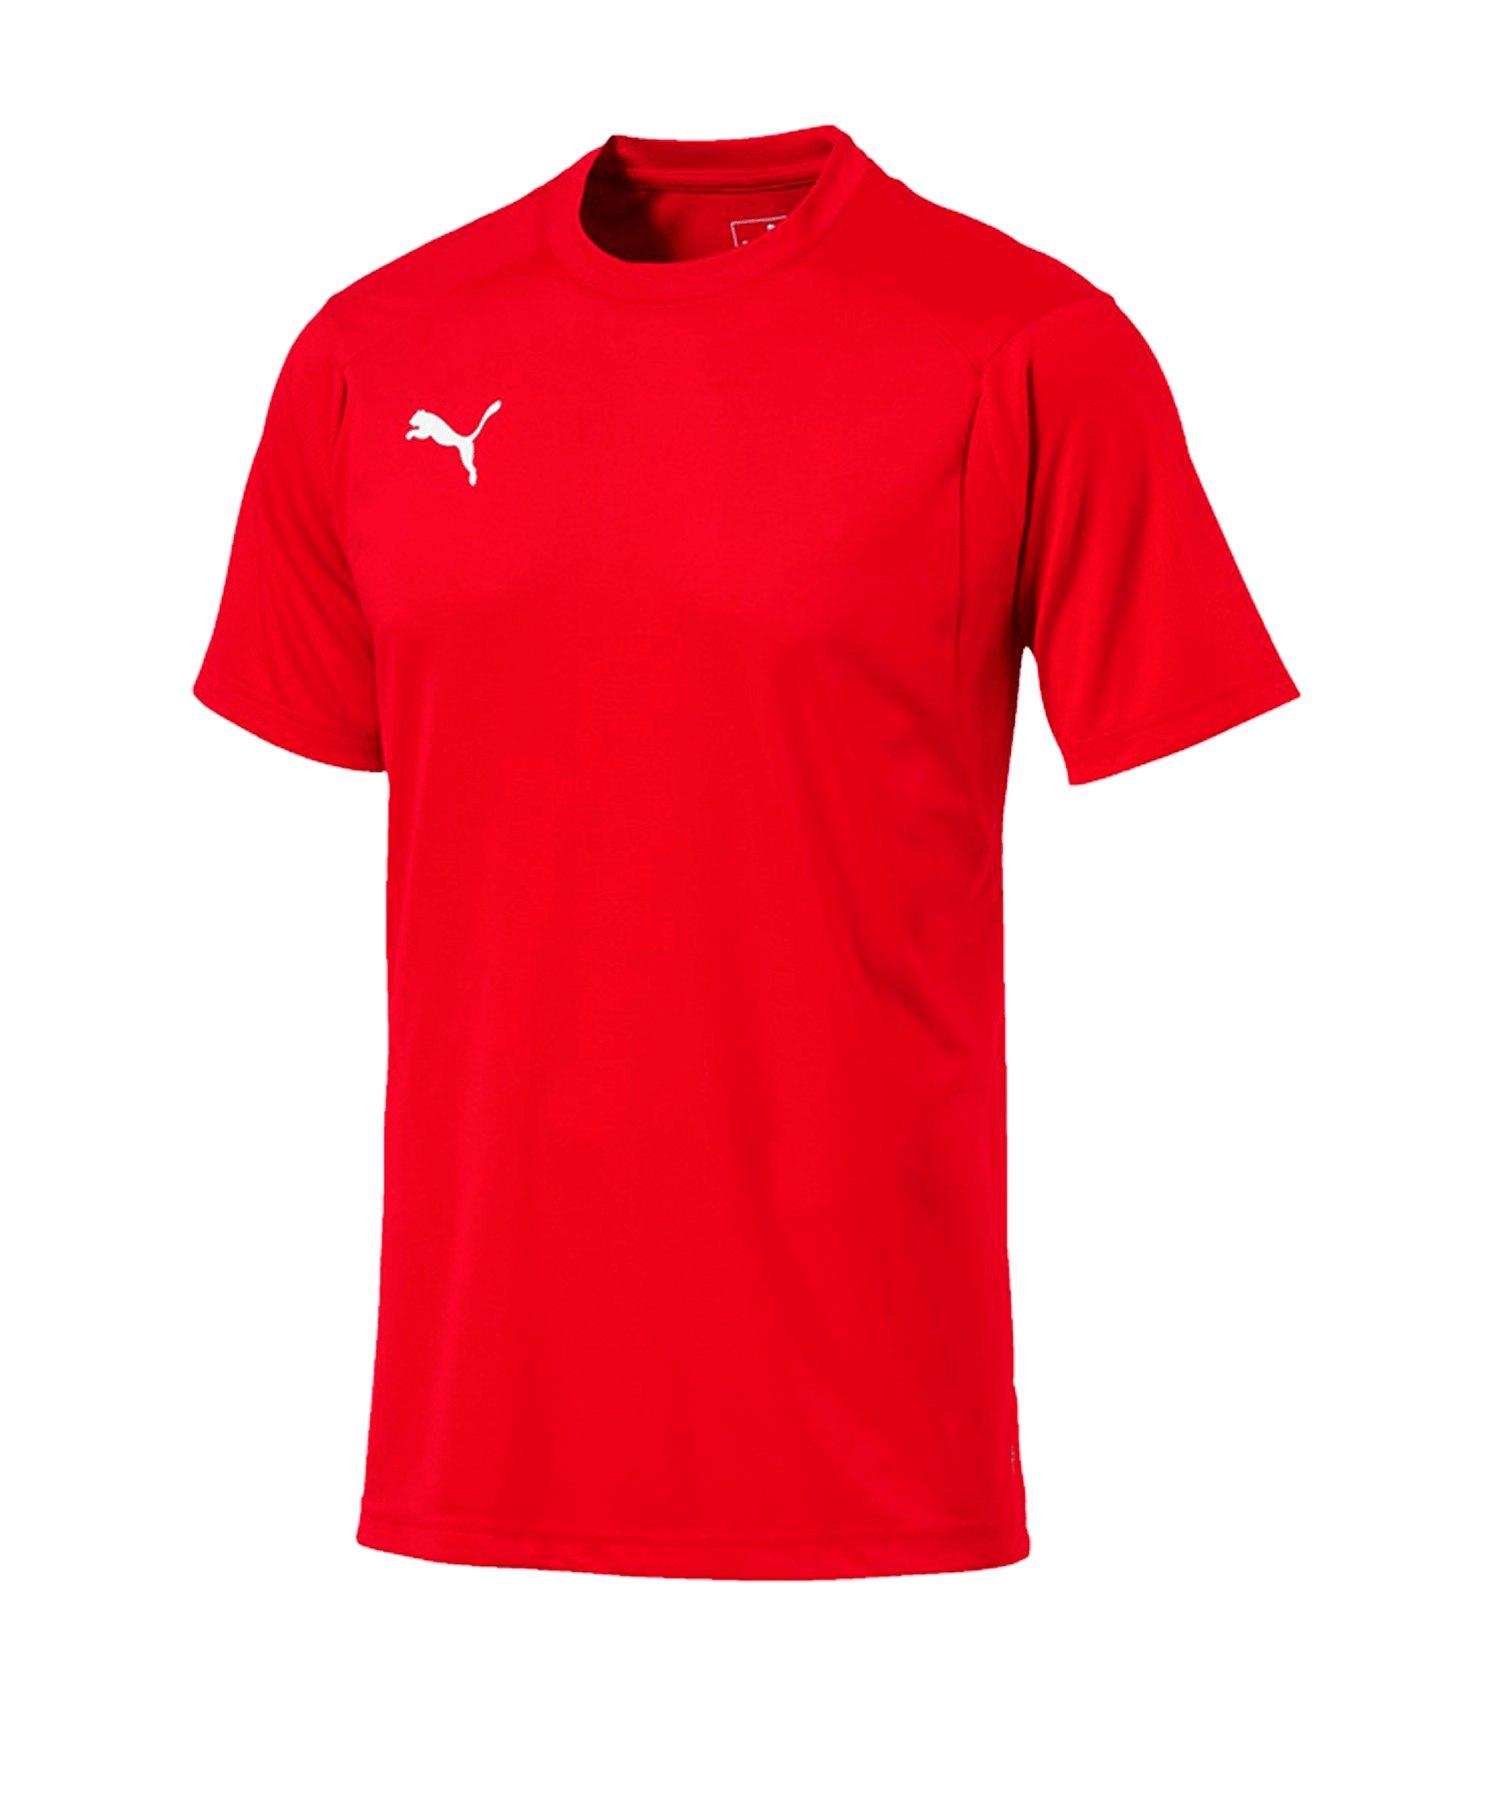 PUMA LIGA Training T-Shirt Rot Weiss F01 - rot